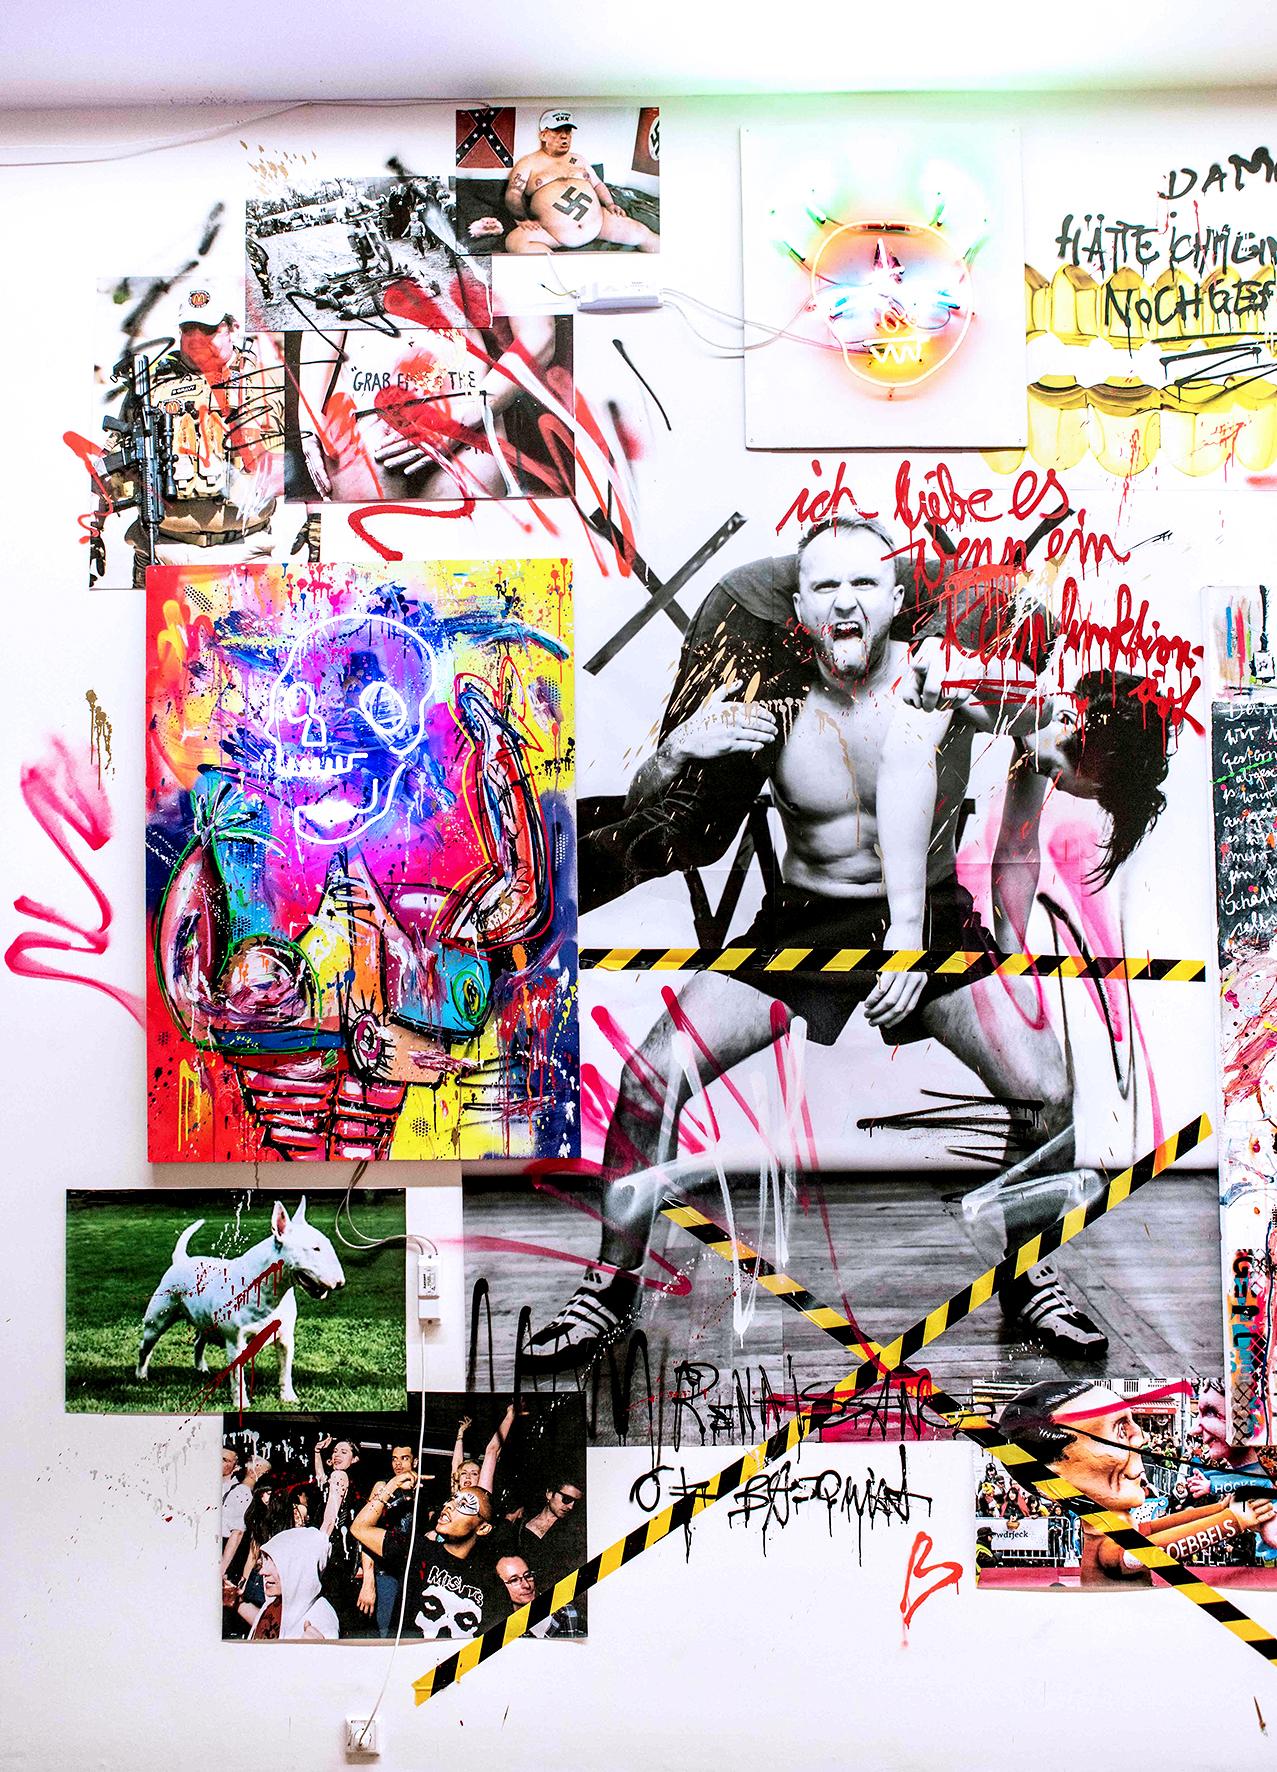 Marc Jung, mixed media installation, 2019, 410x1100cm (detail)